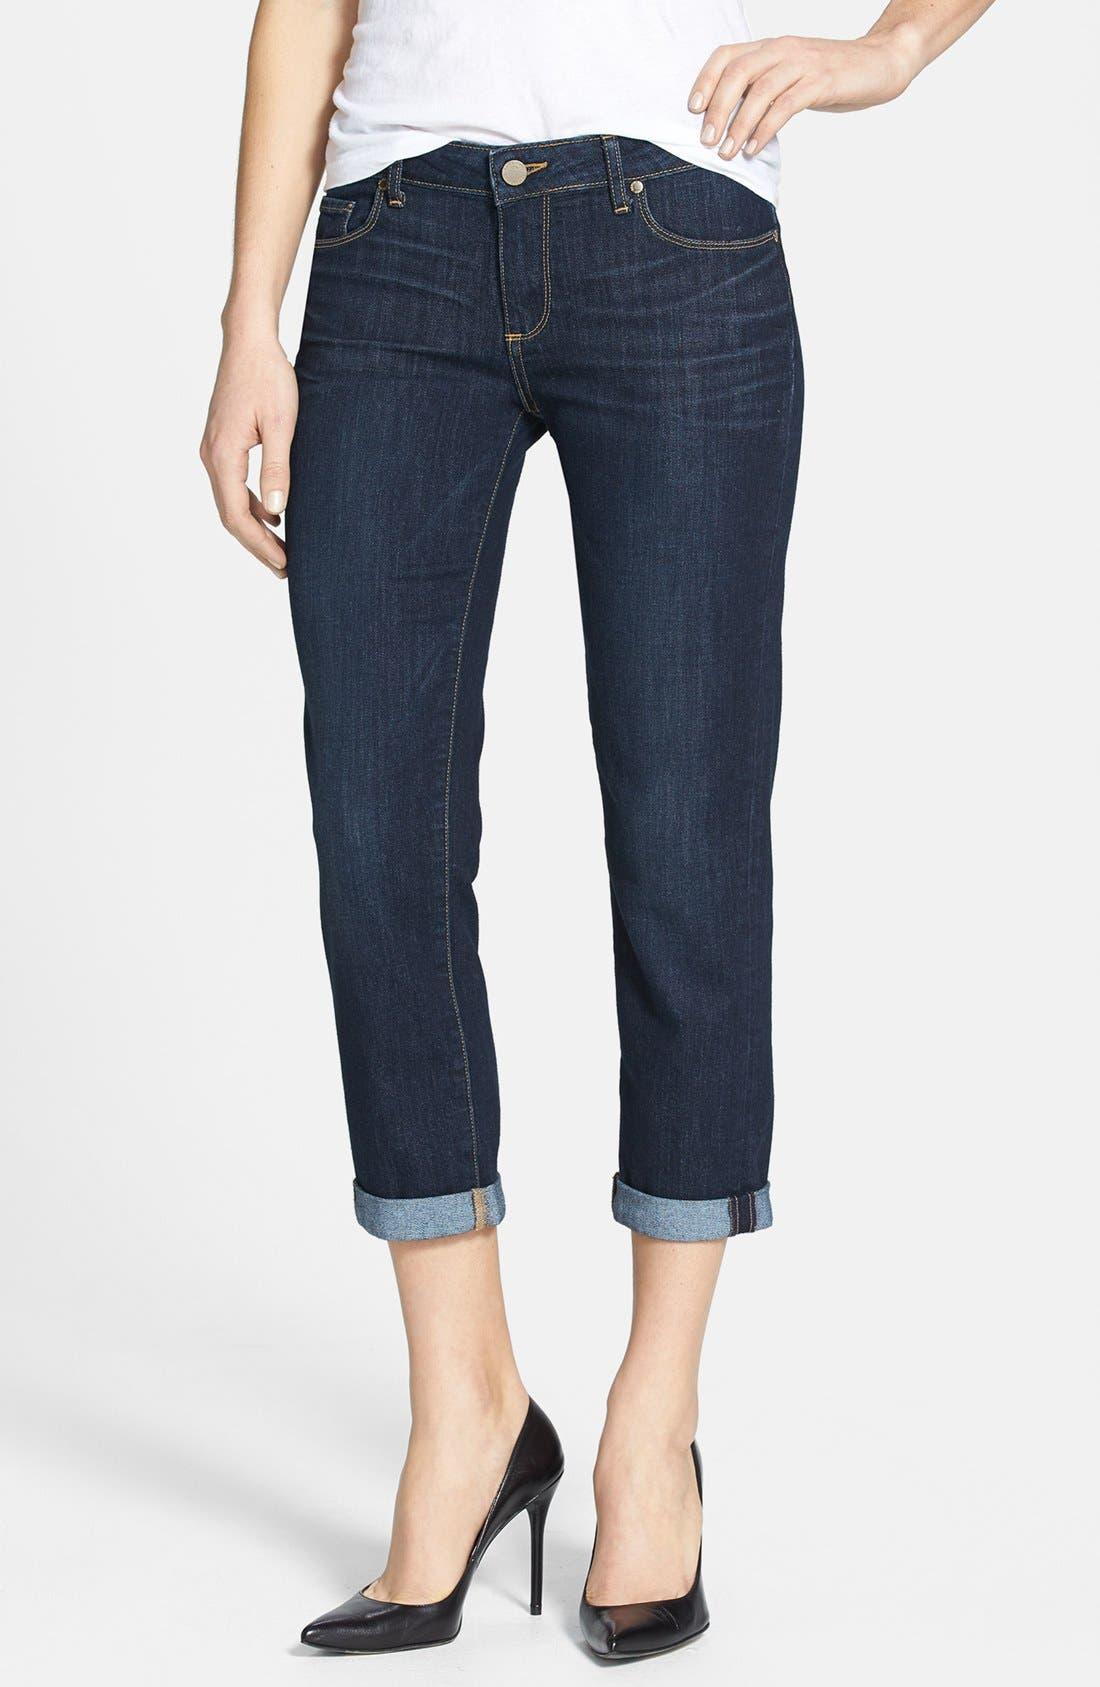 Alternate Image 1 Selected - Paige Denim 'Jimmy Jimmy' Crop Skinny Jeans (Highland)